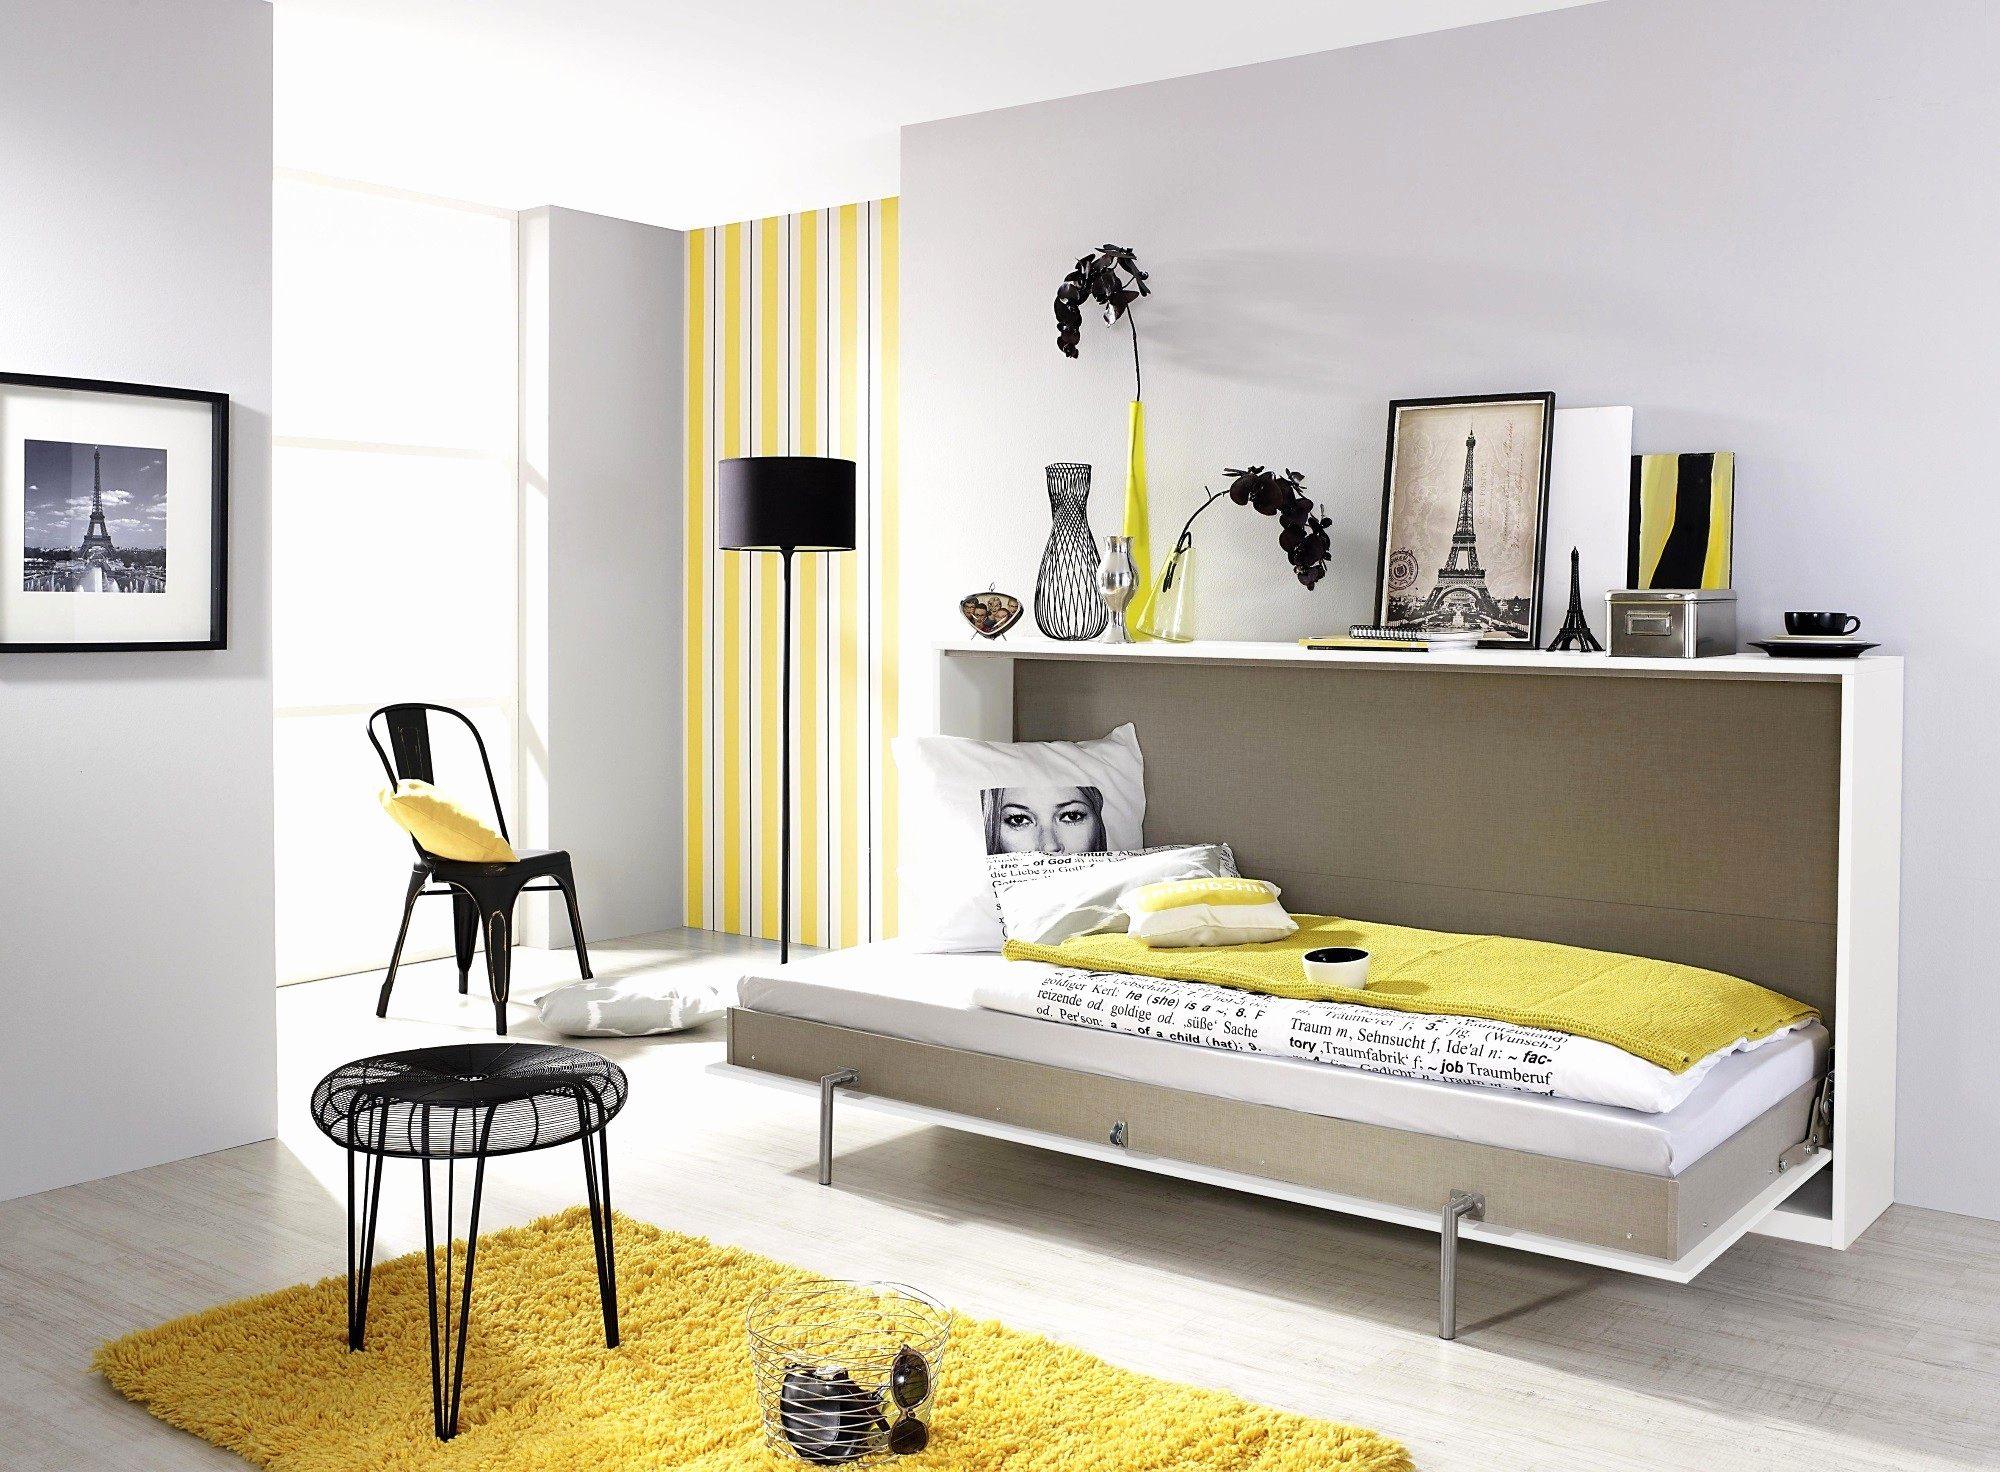 Lit Ikea Rangement Belle Lit Moderne Avec Rangement Meilleur De Lit A Rangement Tete De Lit